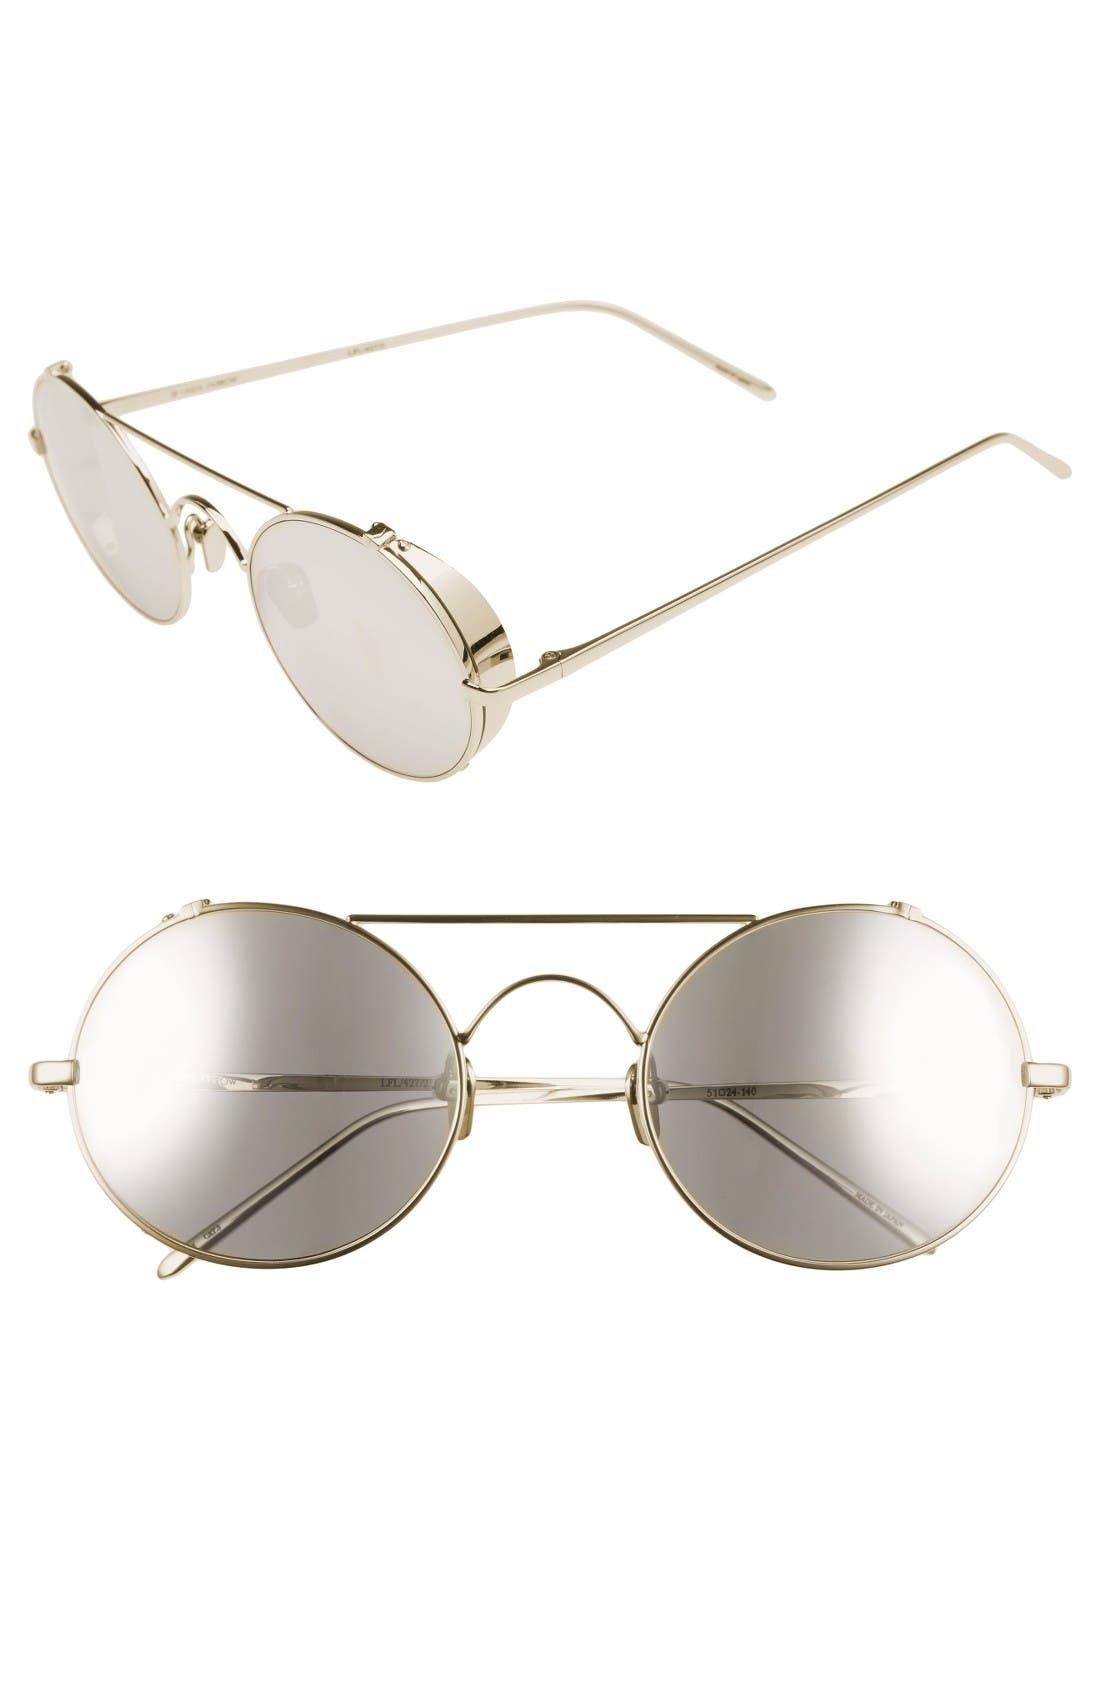 Main Image - Linda Farrow 51mm Oval Sunglasses